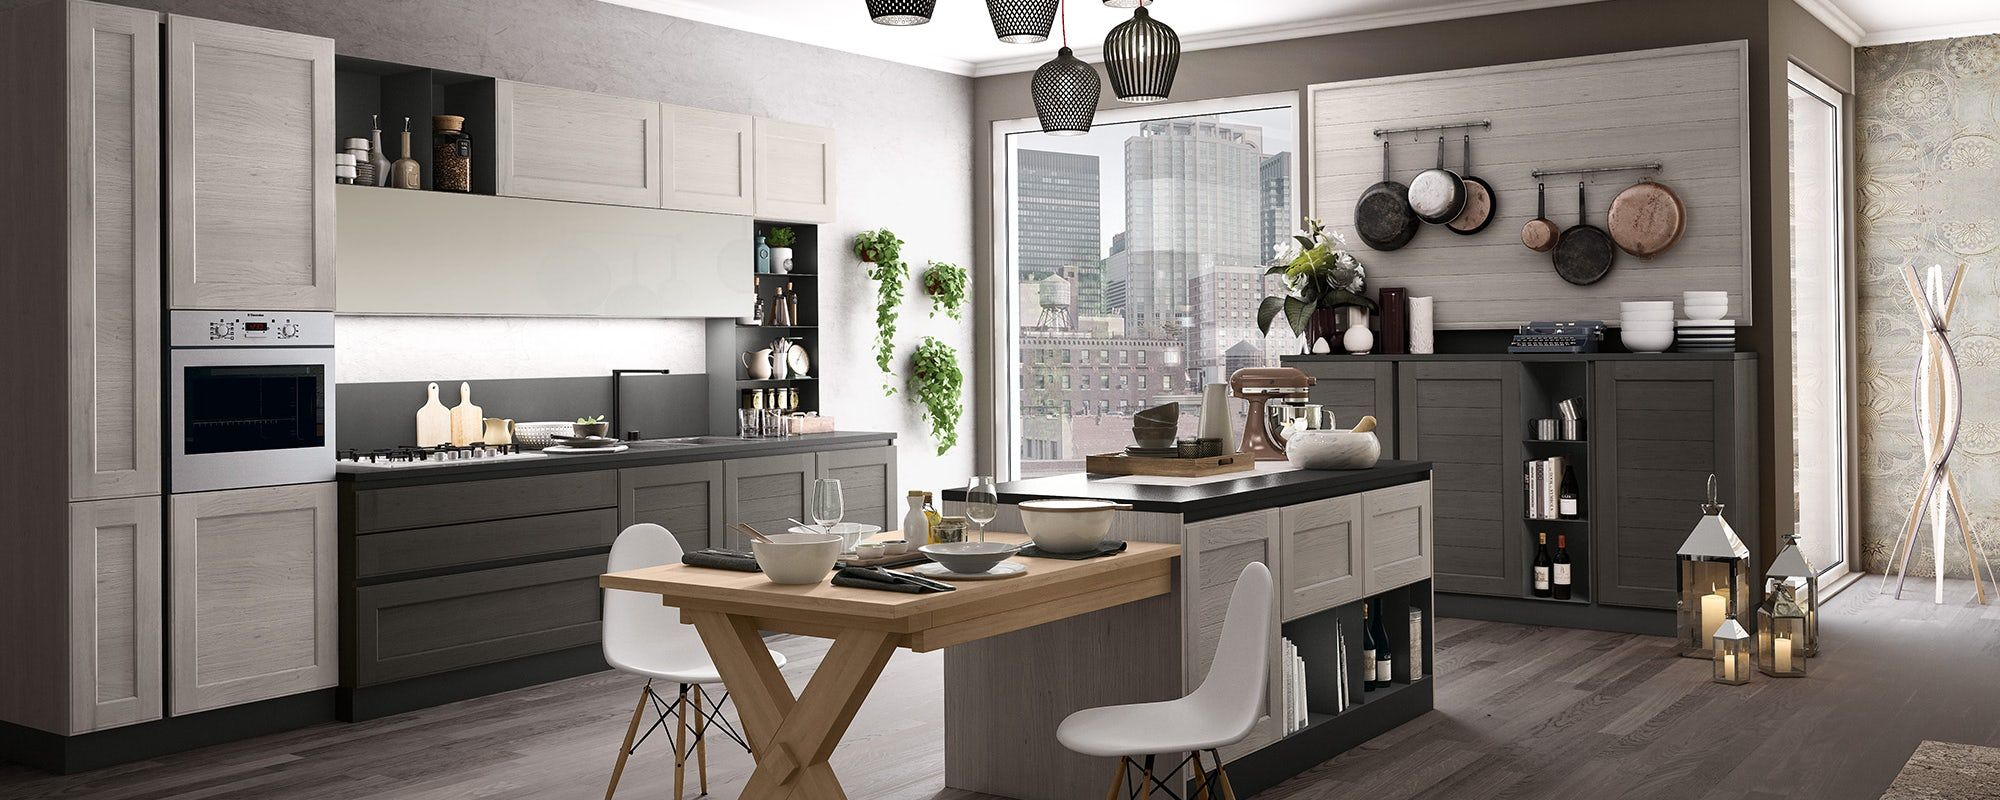 Cucina Stosa New York | Stunning Cucina Stosa Patty Gallery House ...